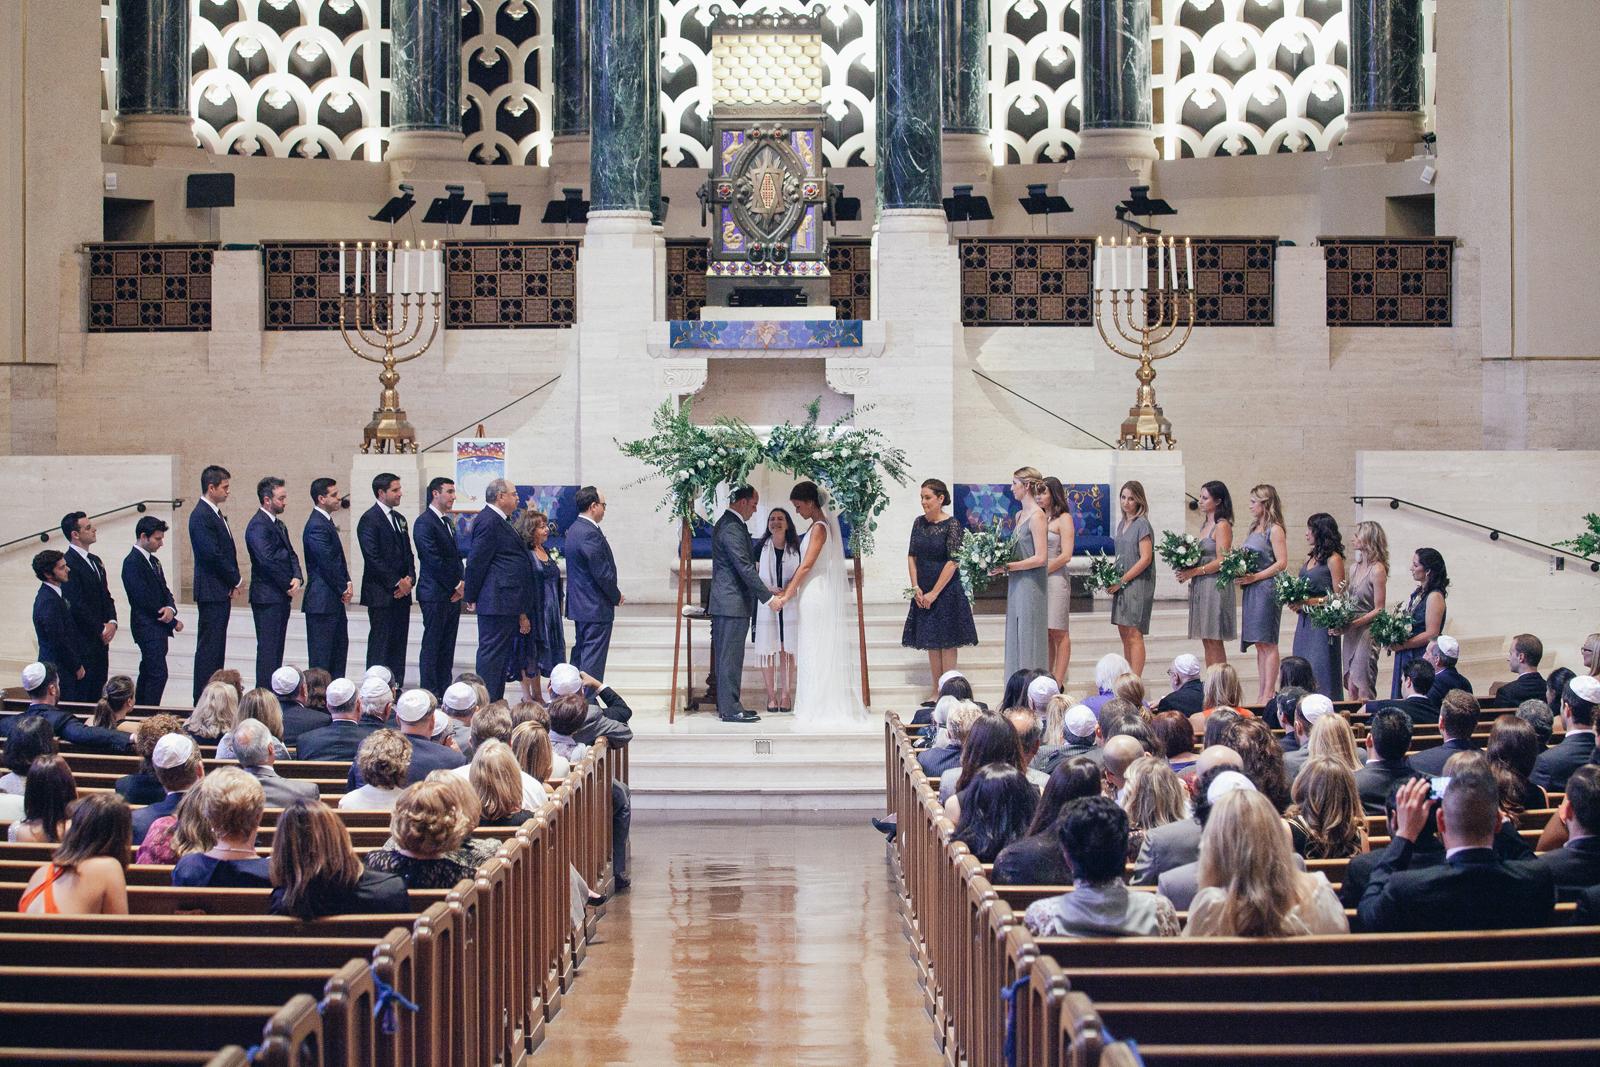 temple_emmanuel_jewish_wedding_san_francisco_ca_sarah_andrew_ebony_siovhan_bokeh_photography_50.jpg